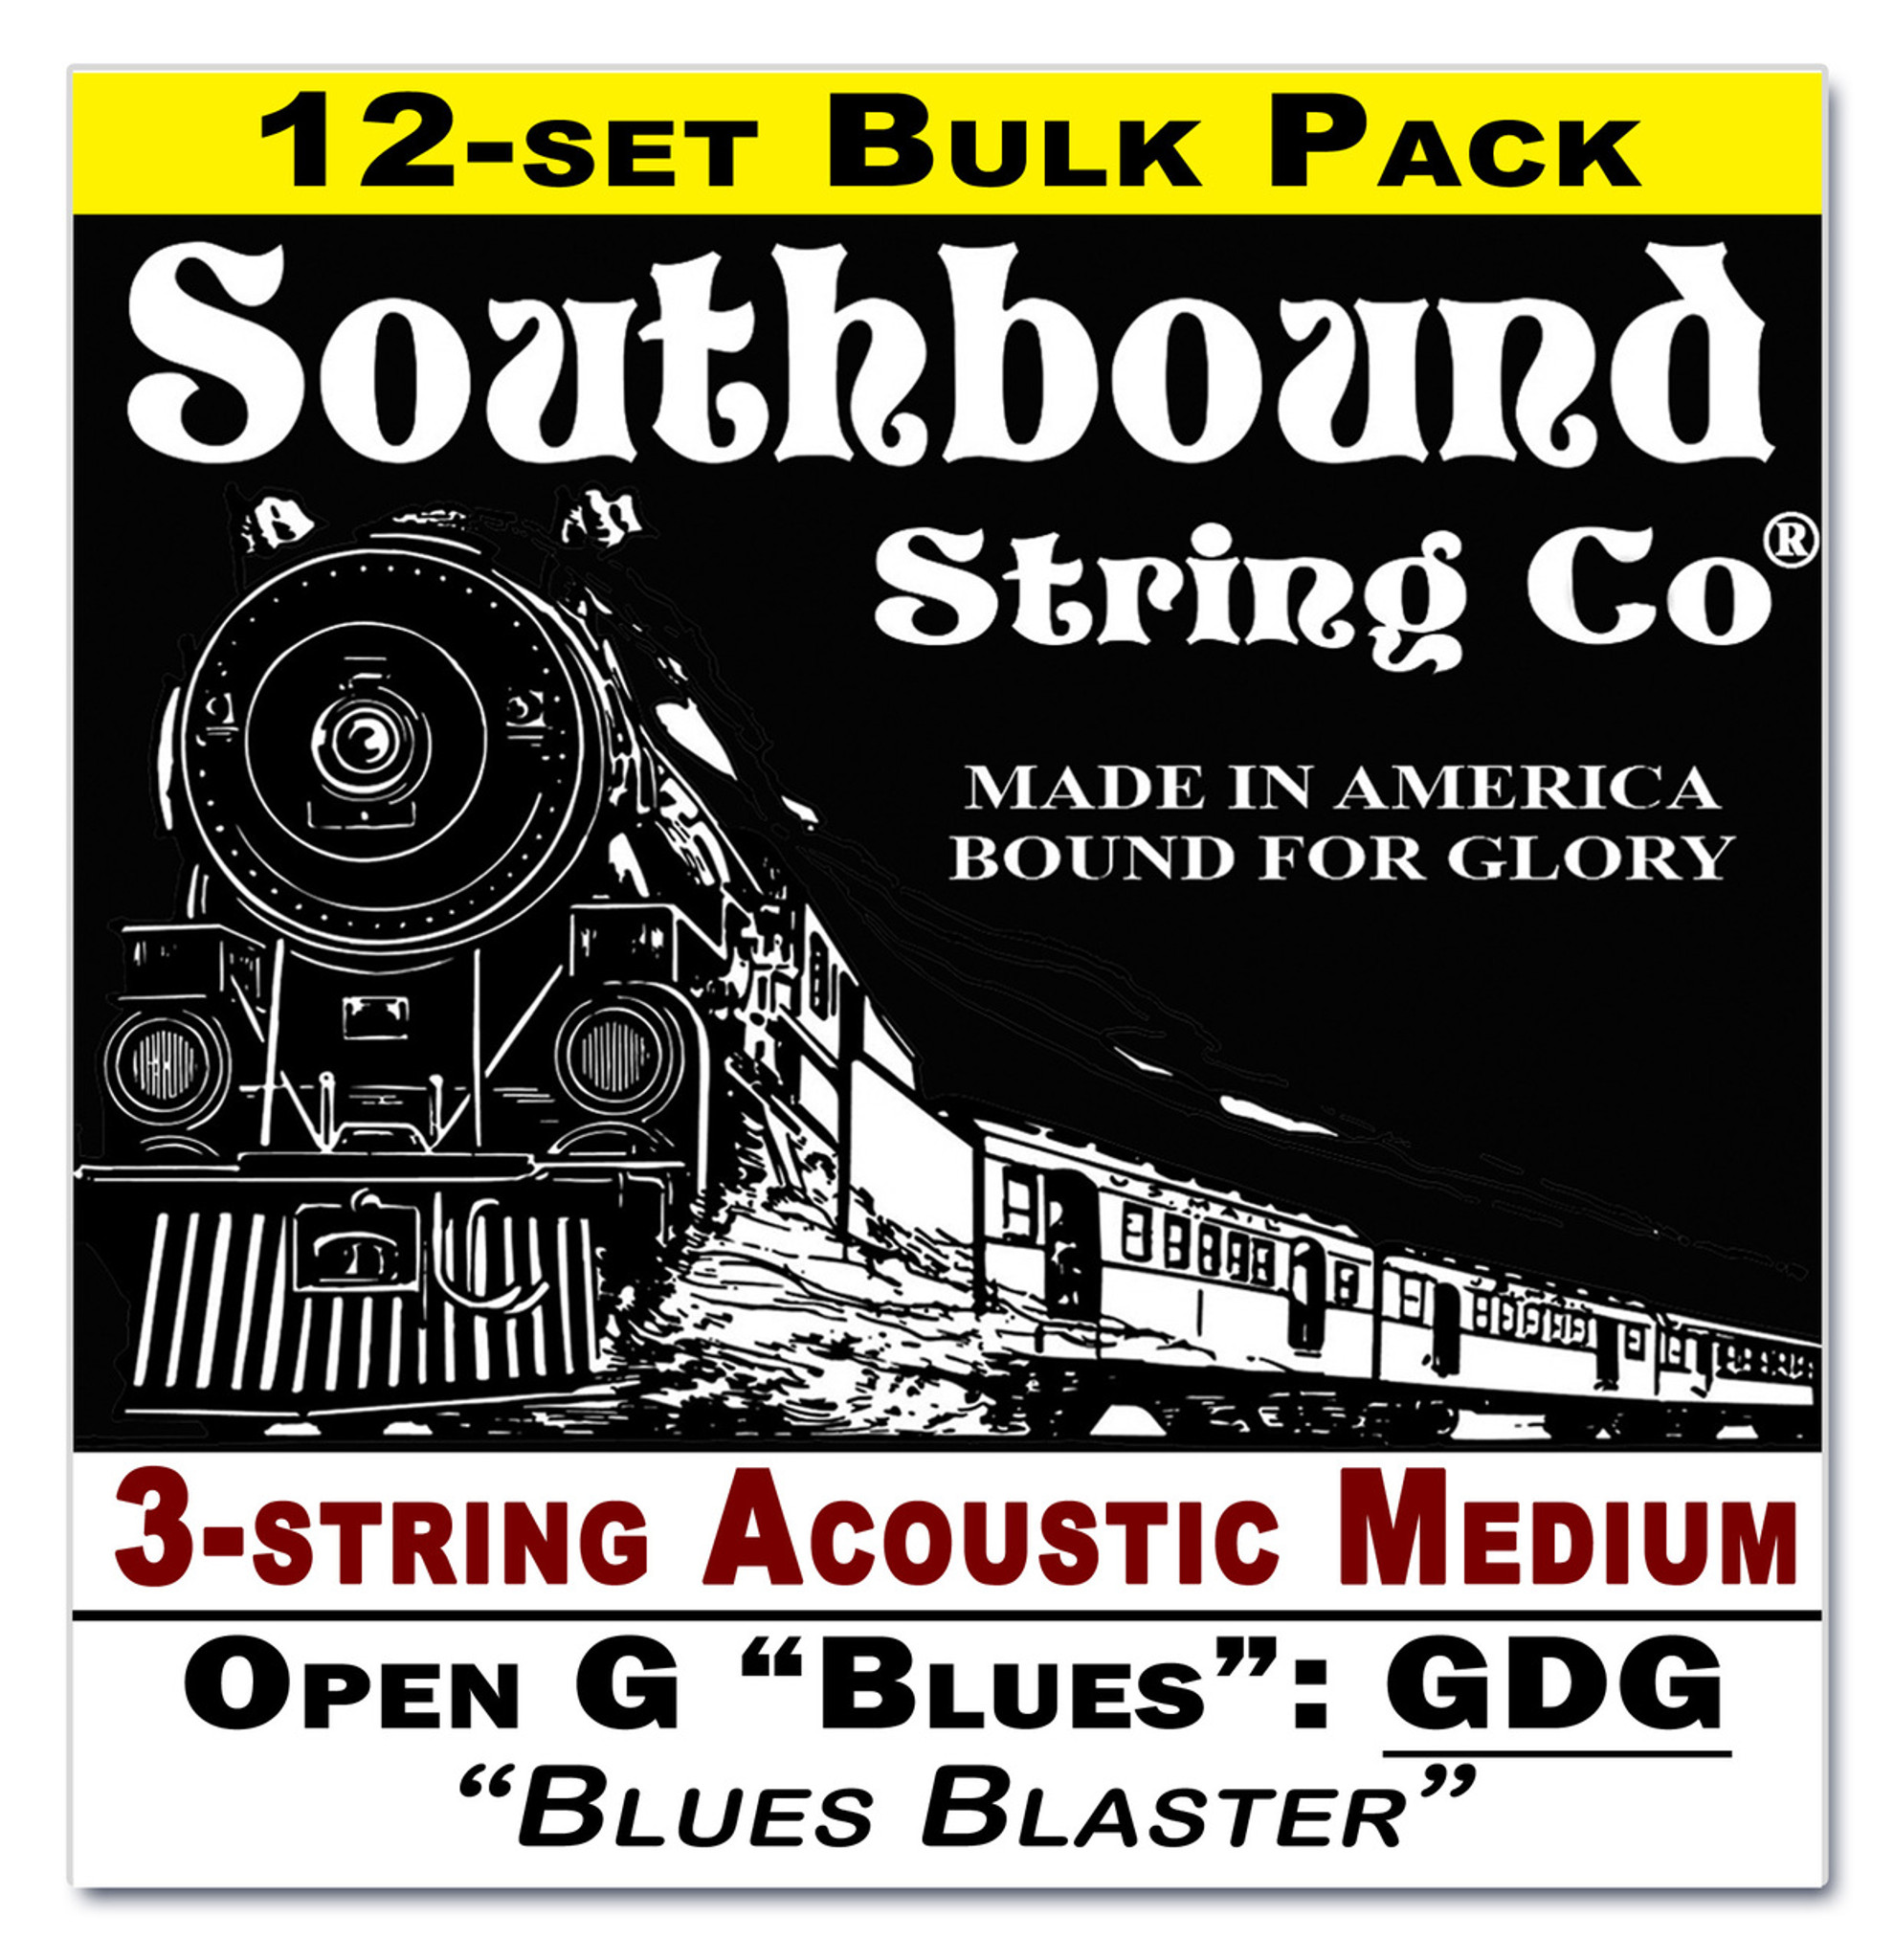 12 pack 3 string cbg strings low open g blues gdg tuning acoustic medium c b gitty. Black Bedroom Furniture Sets. Home Design Ideas